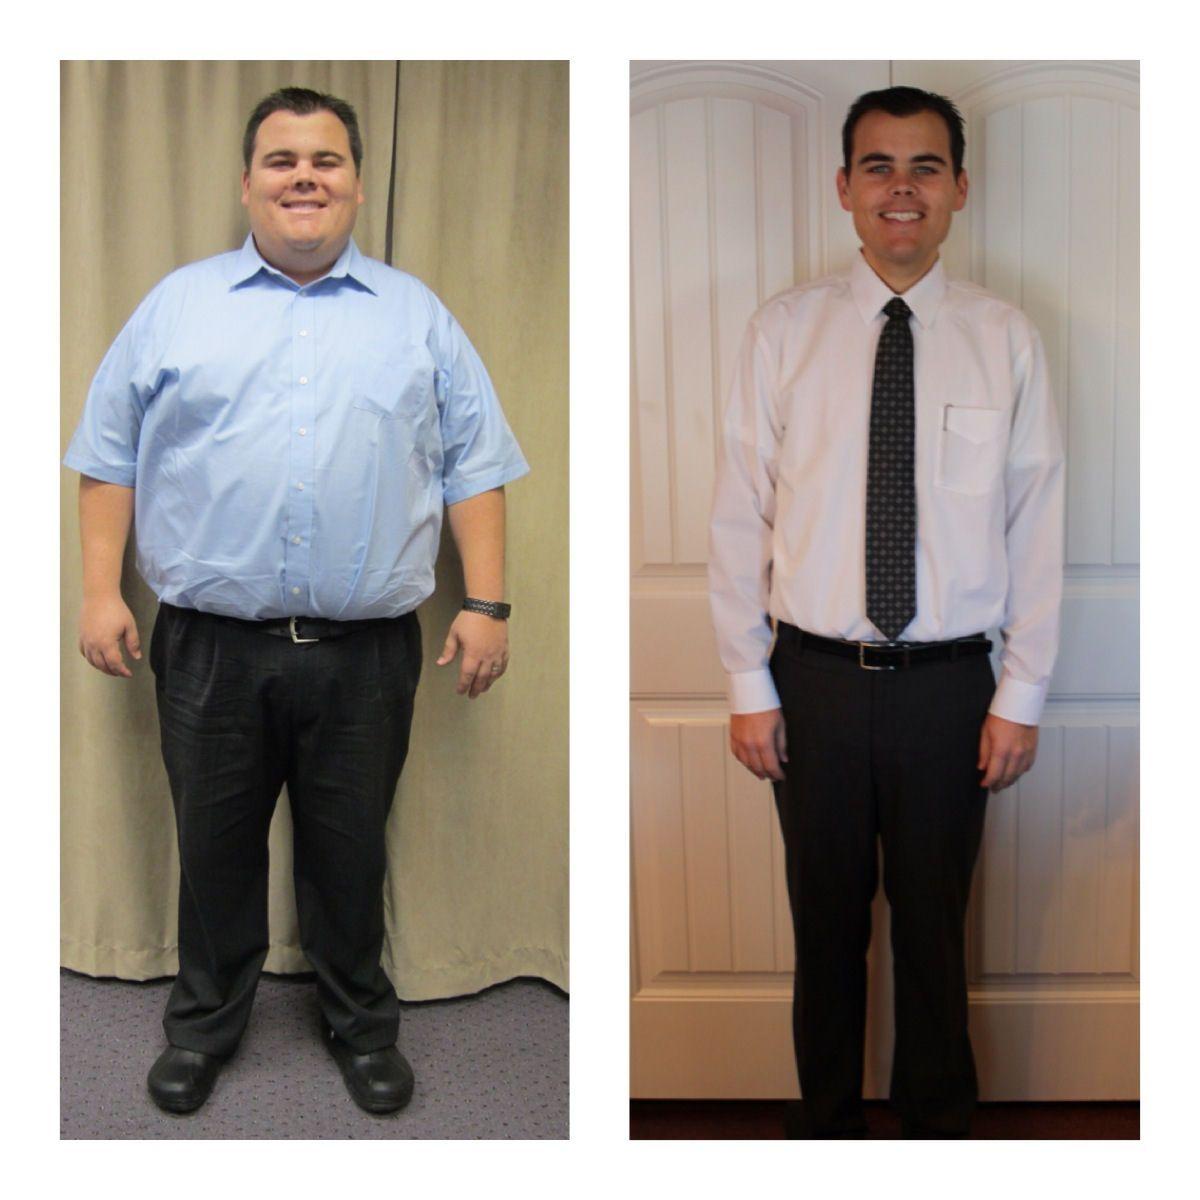 Vi shape weight loss reviews image 10